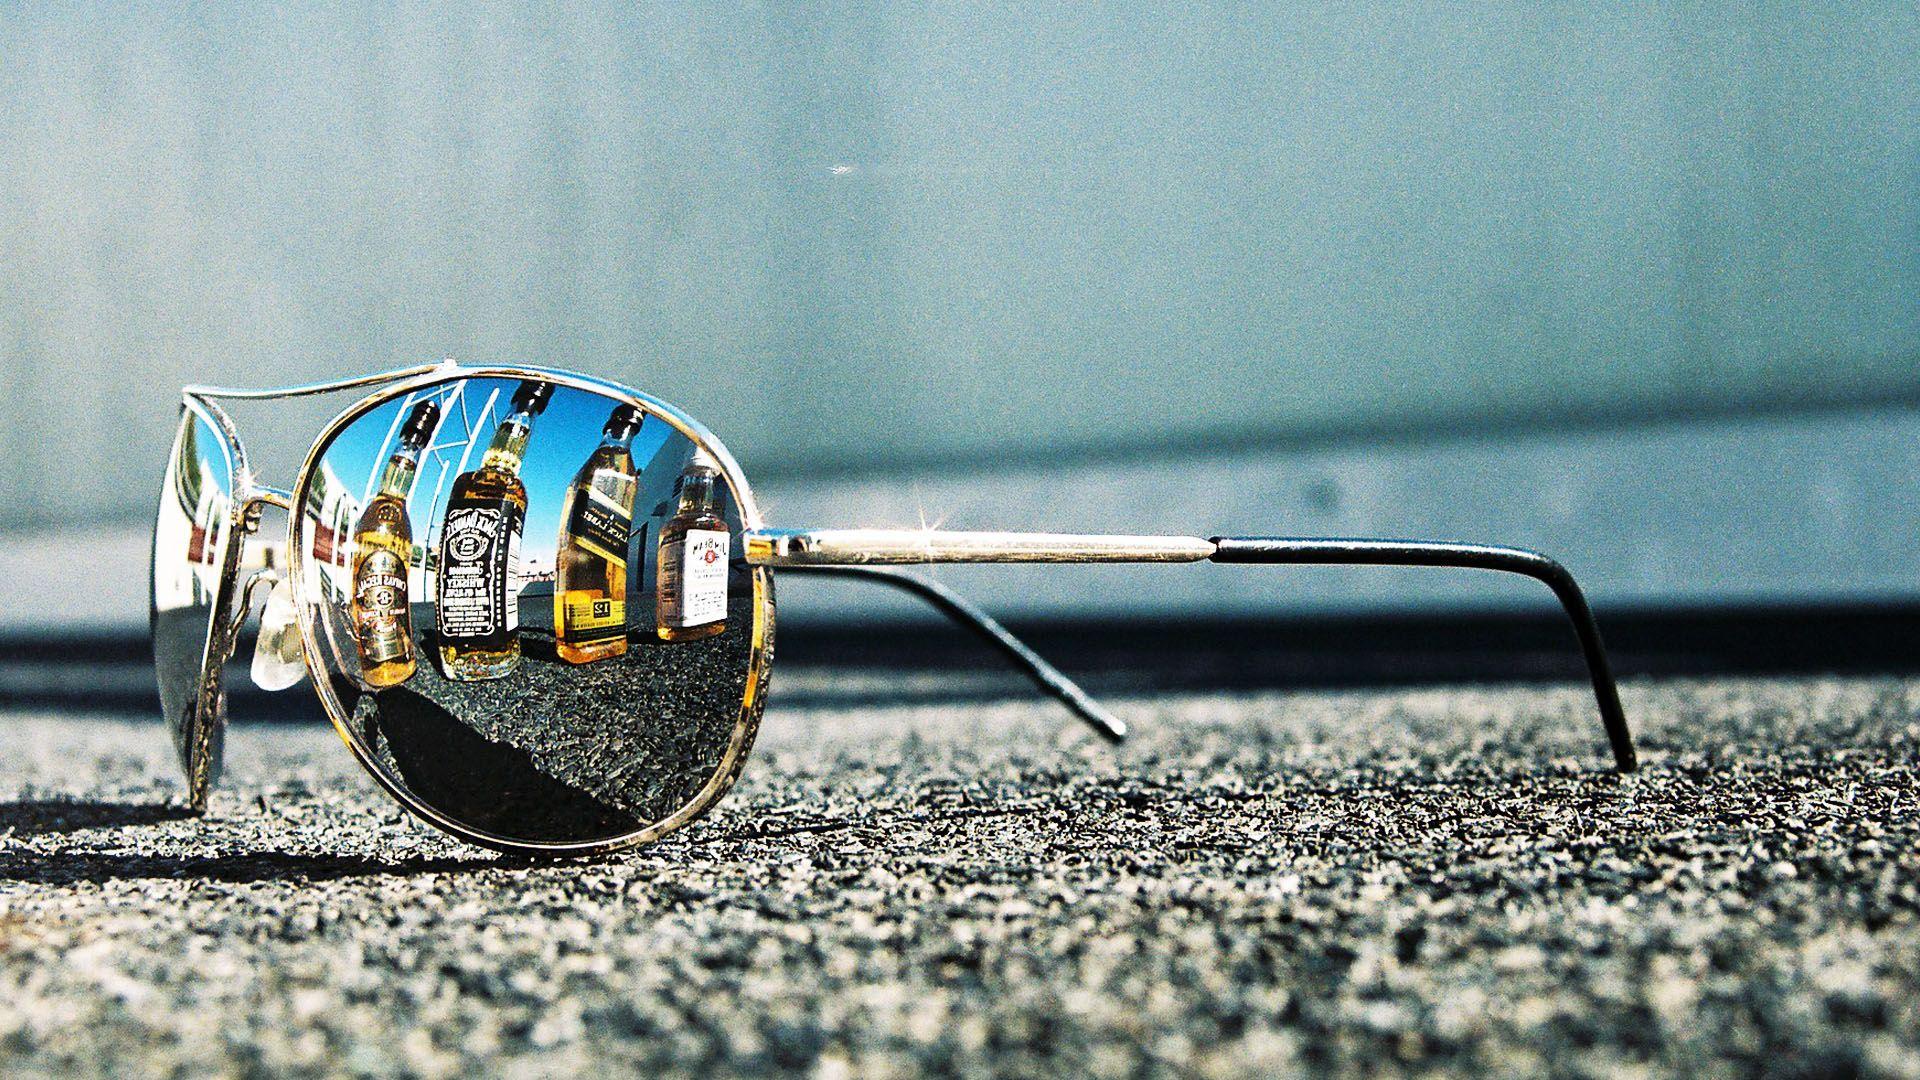 abstract photography ideas | Photography ideas | Pinterest ...